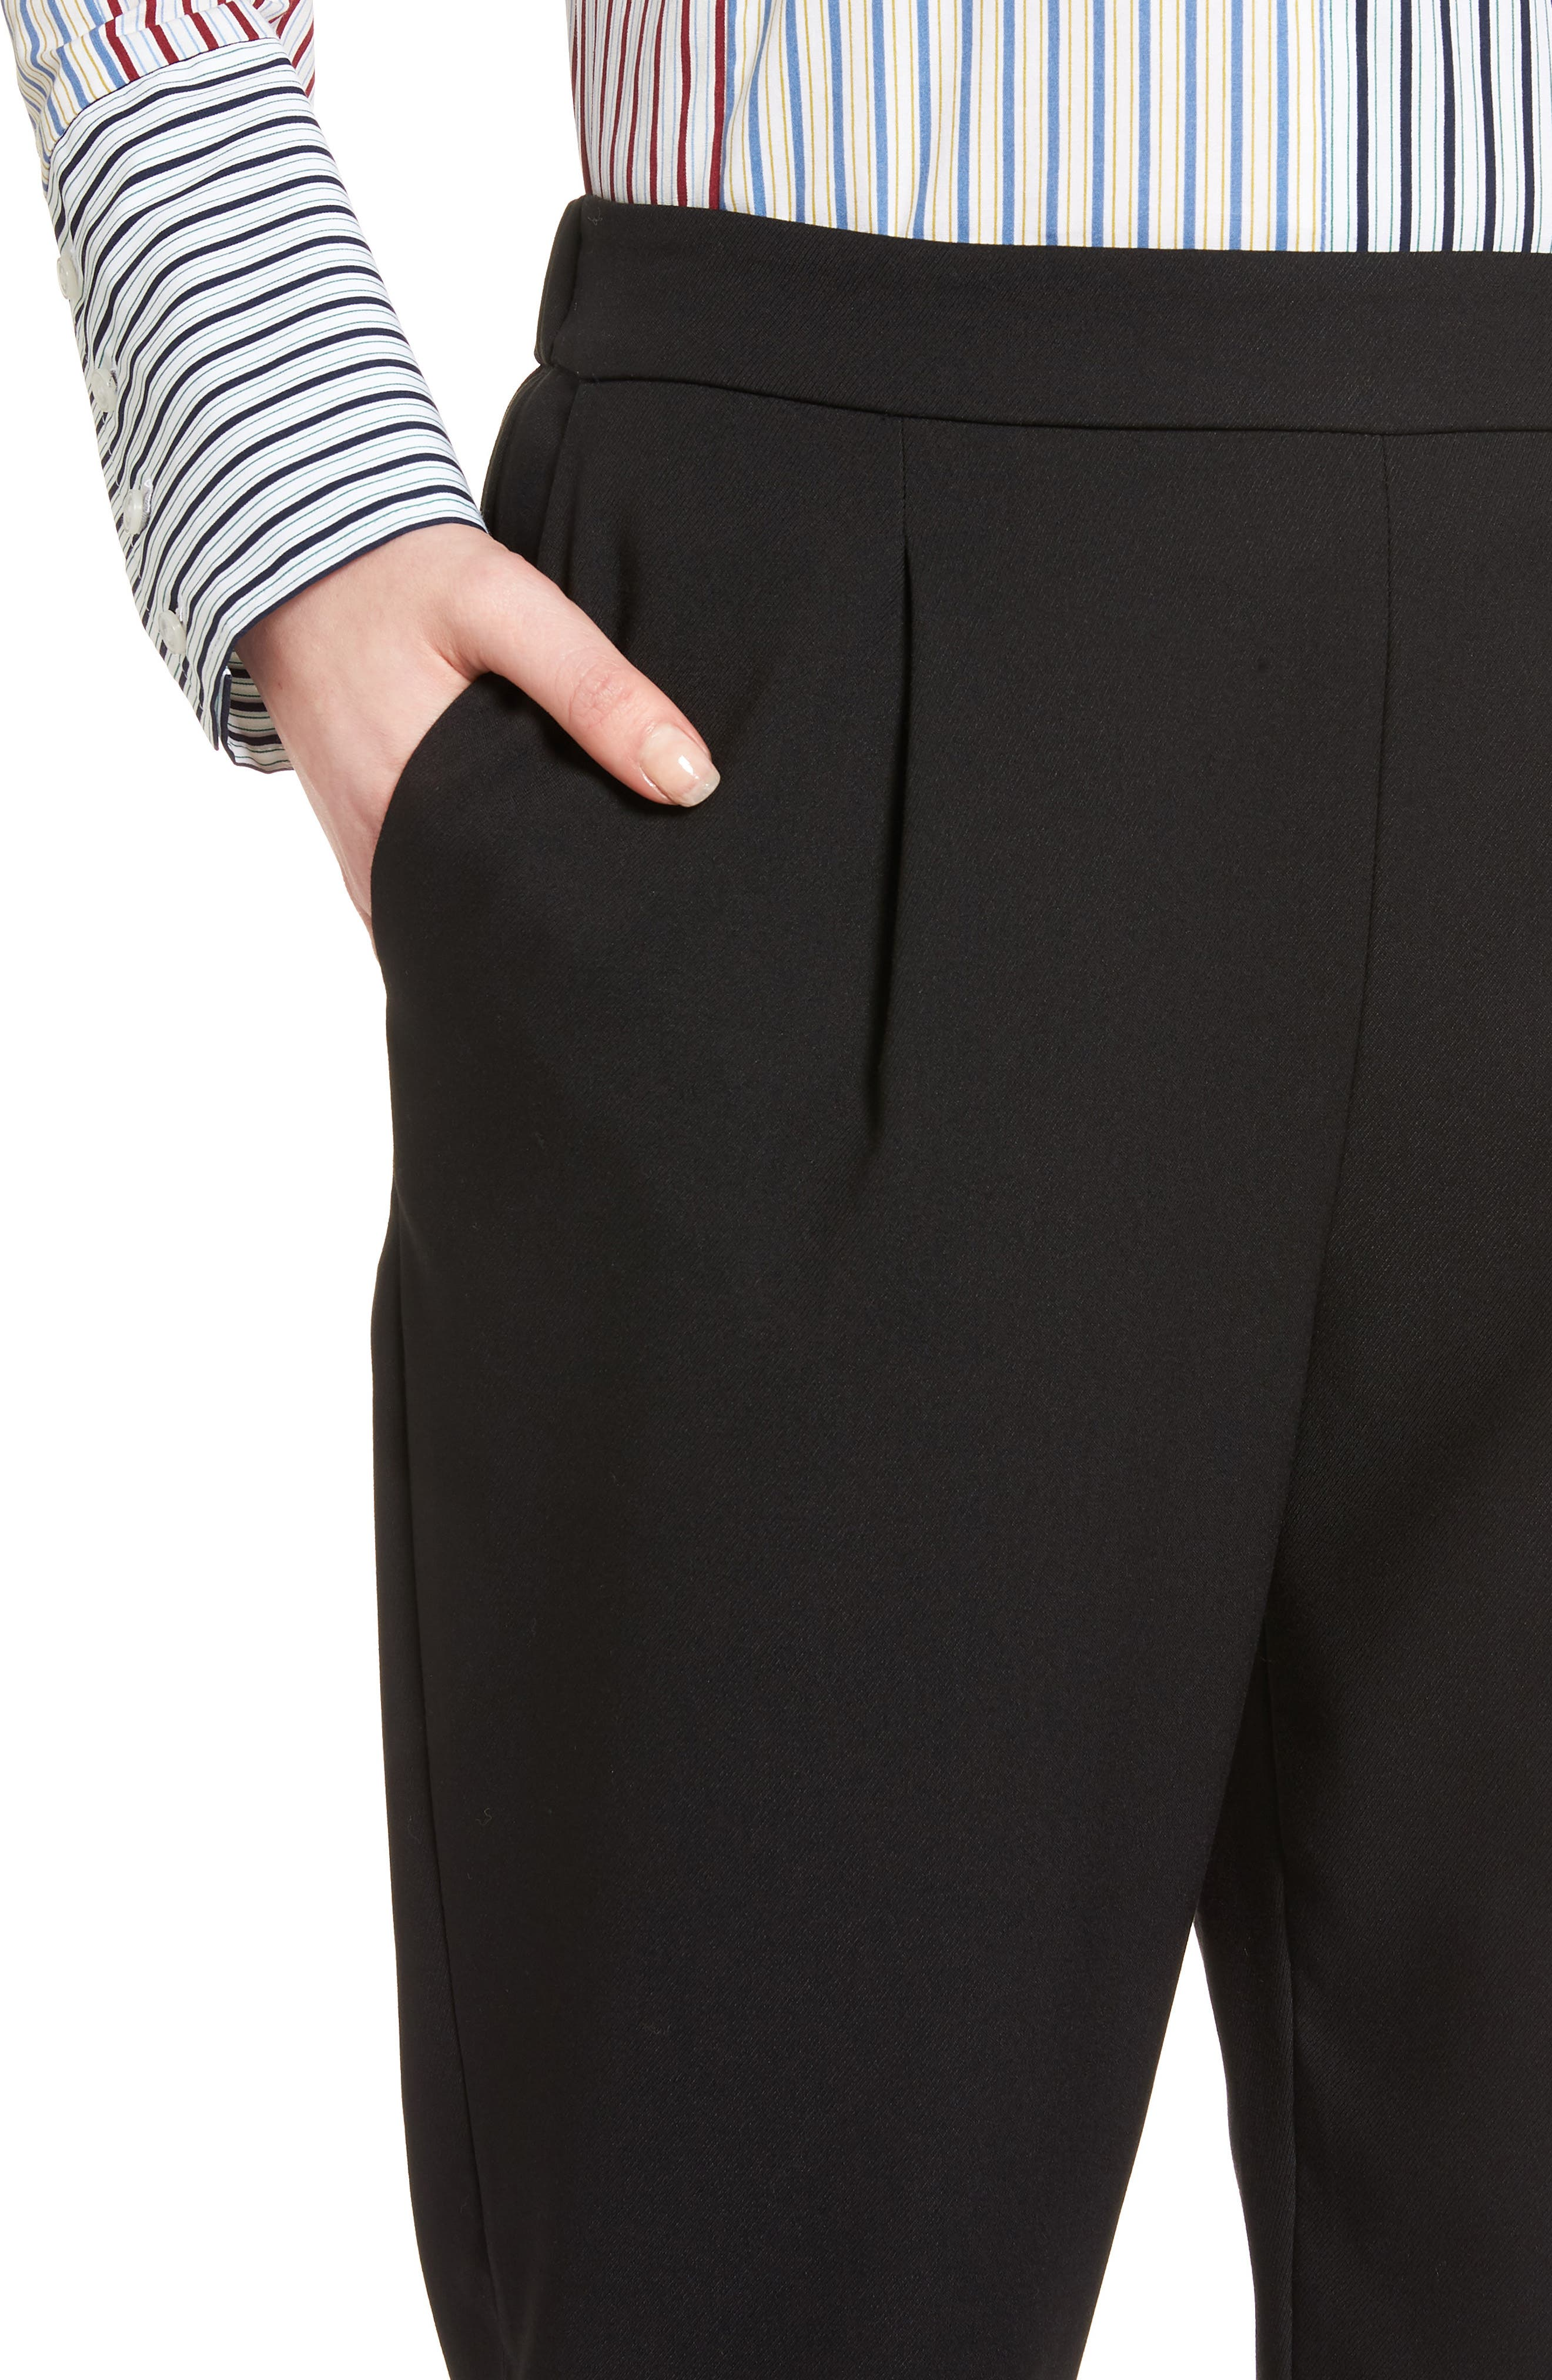 Twill Ankle Pants,                             Alternate thumbnail 4, color,                             Black